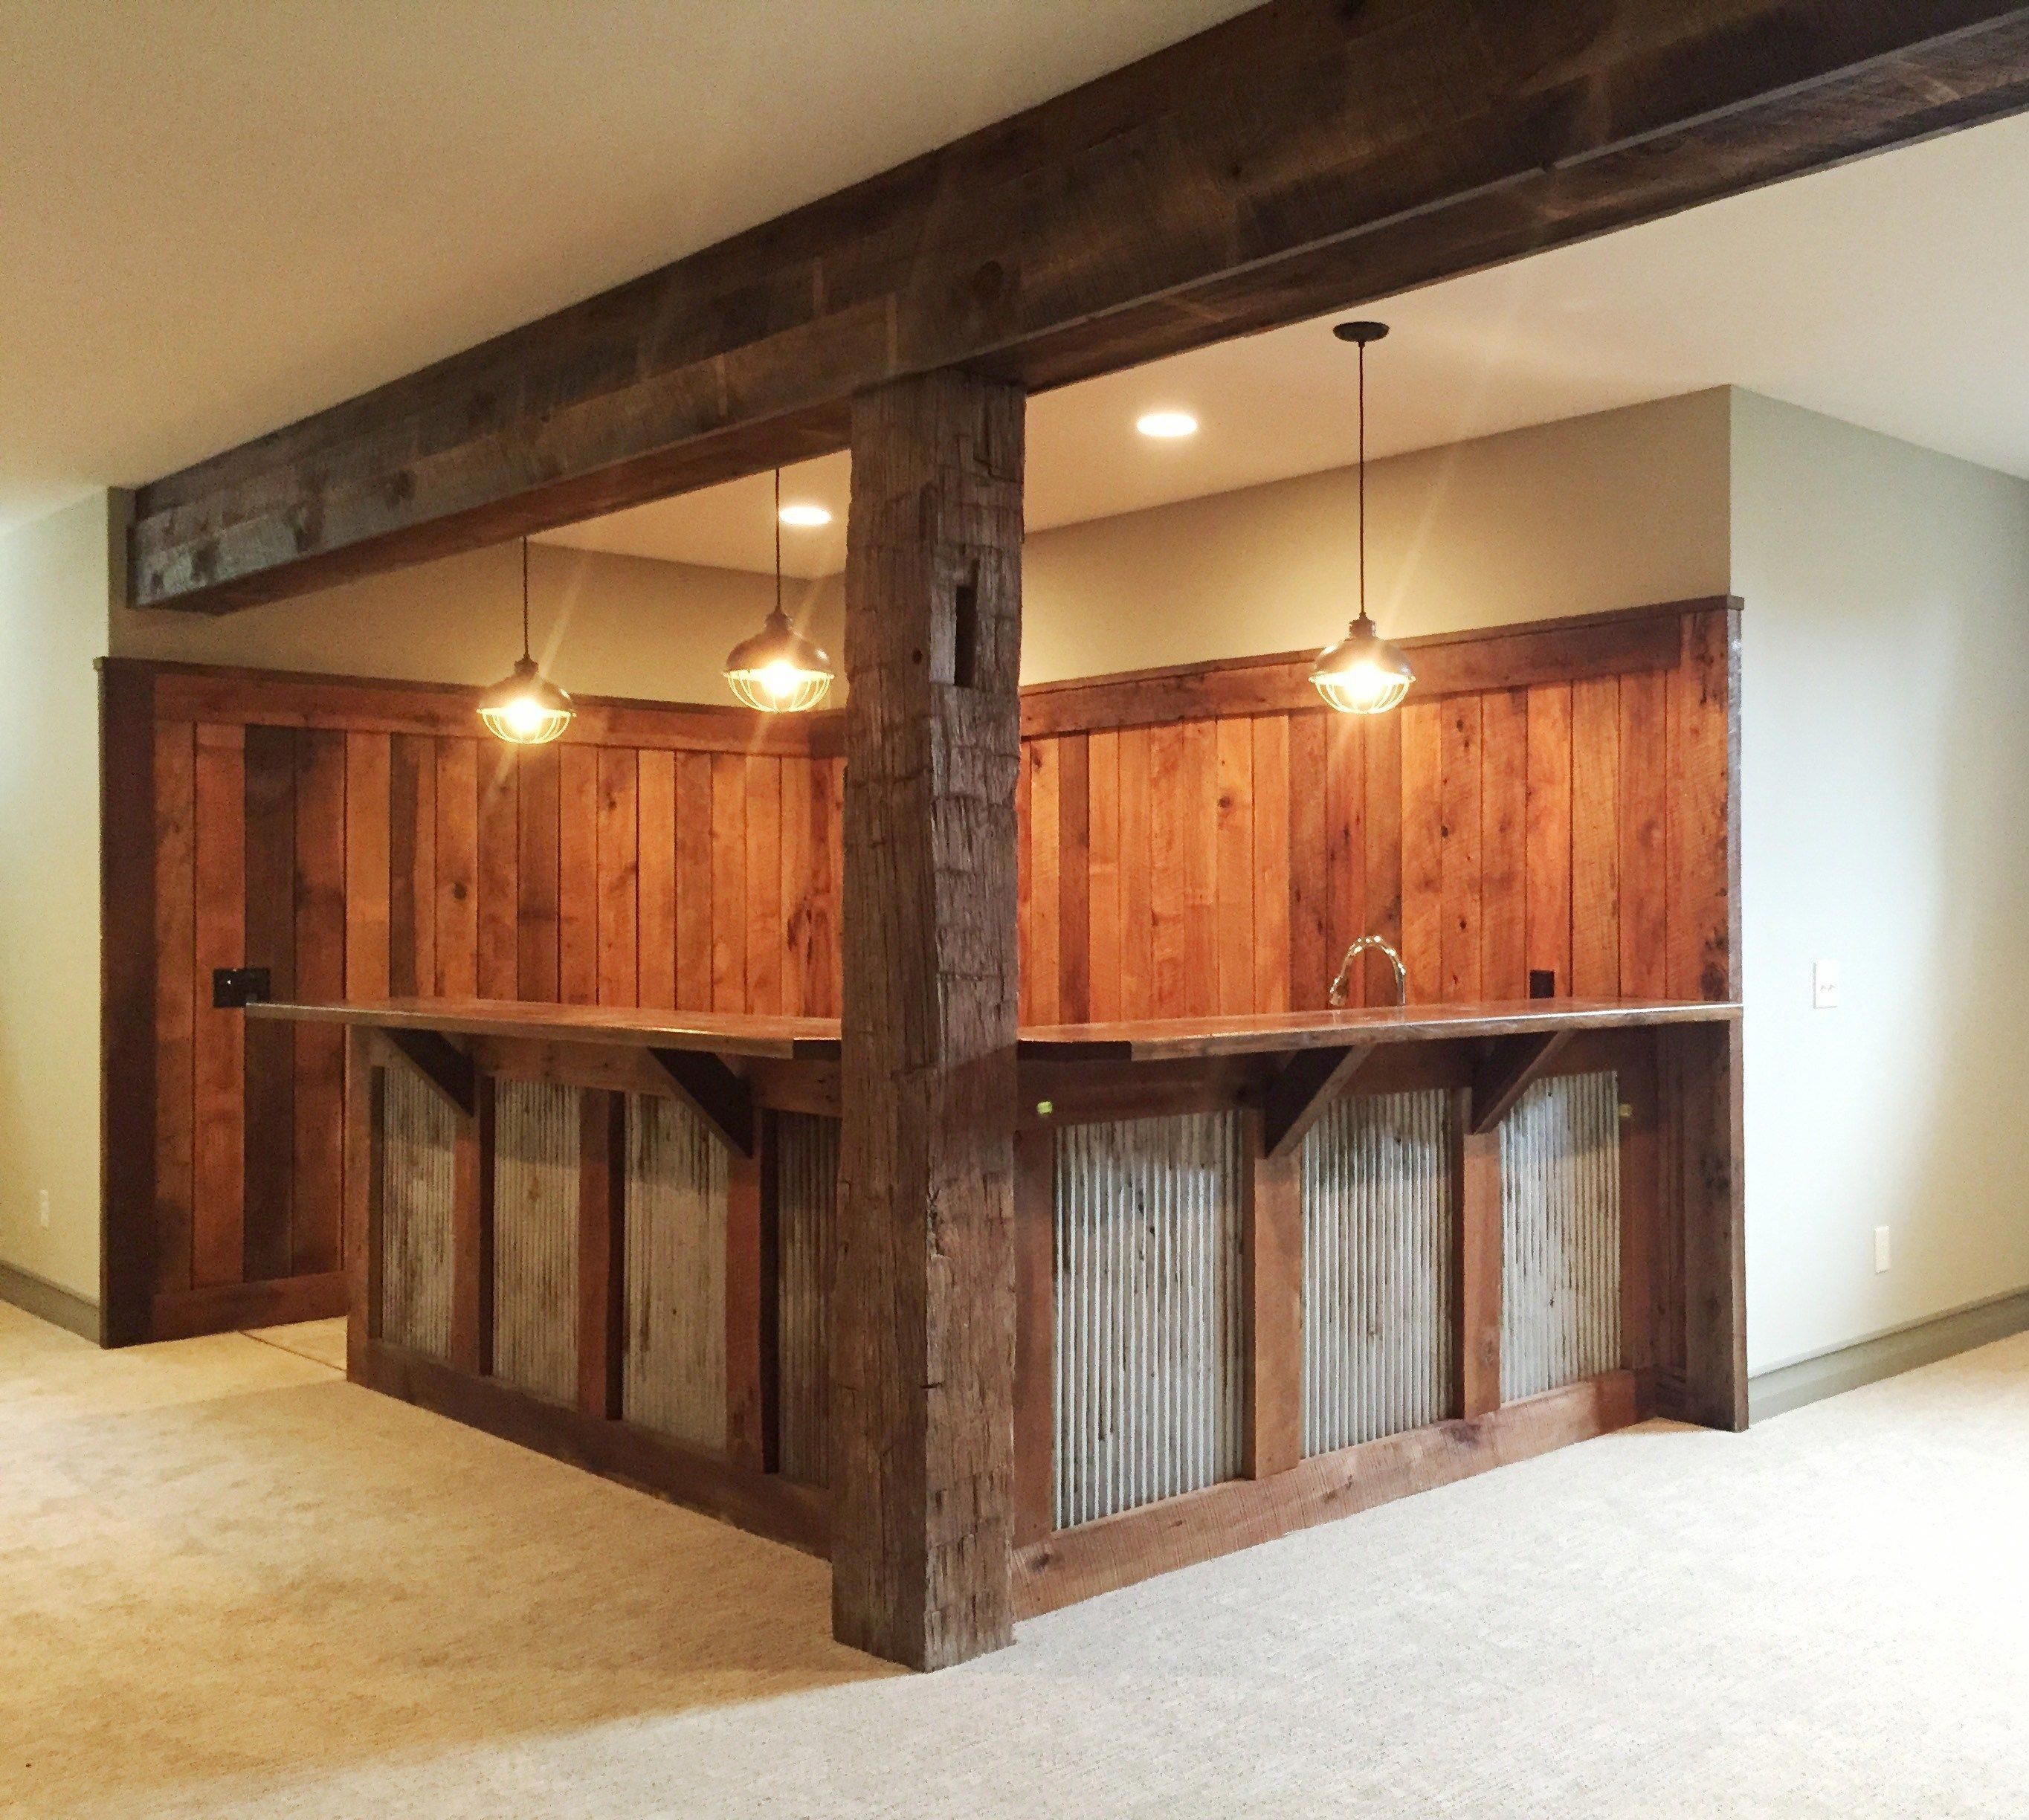 Man Cave Bar Diy Rustic Basement Bar Home Bar Designs Basement Bar Designs